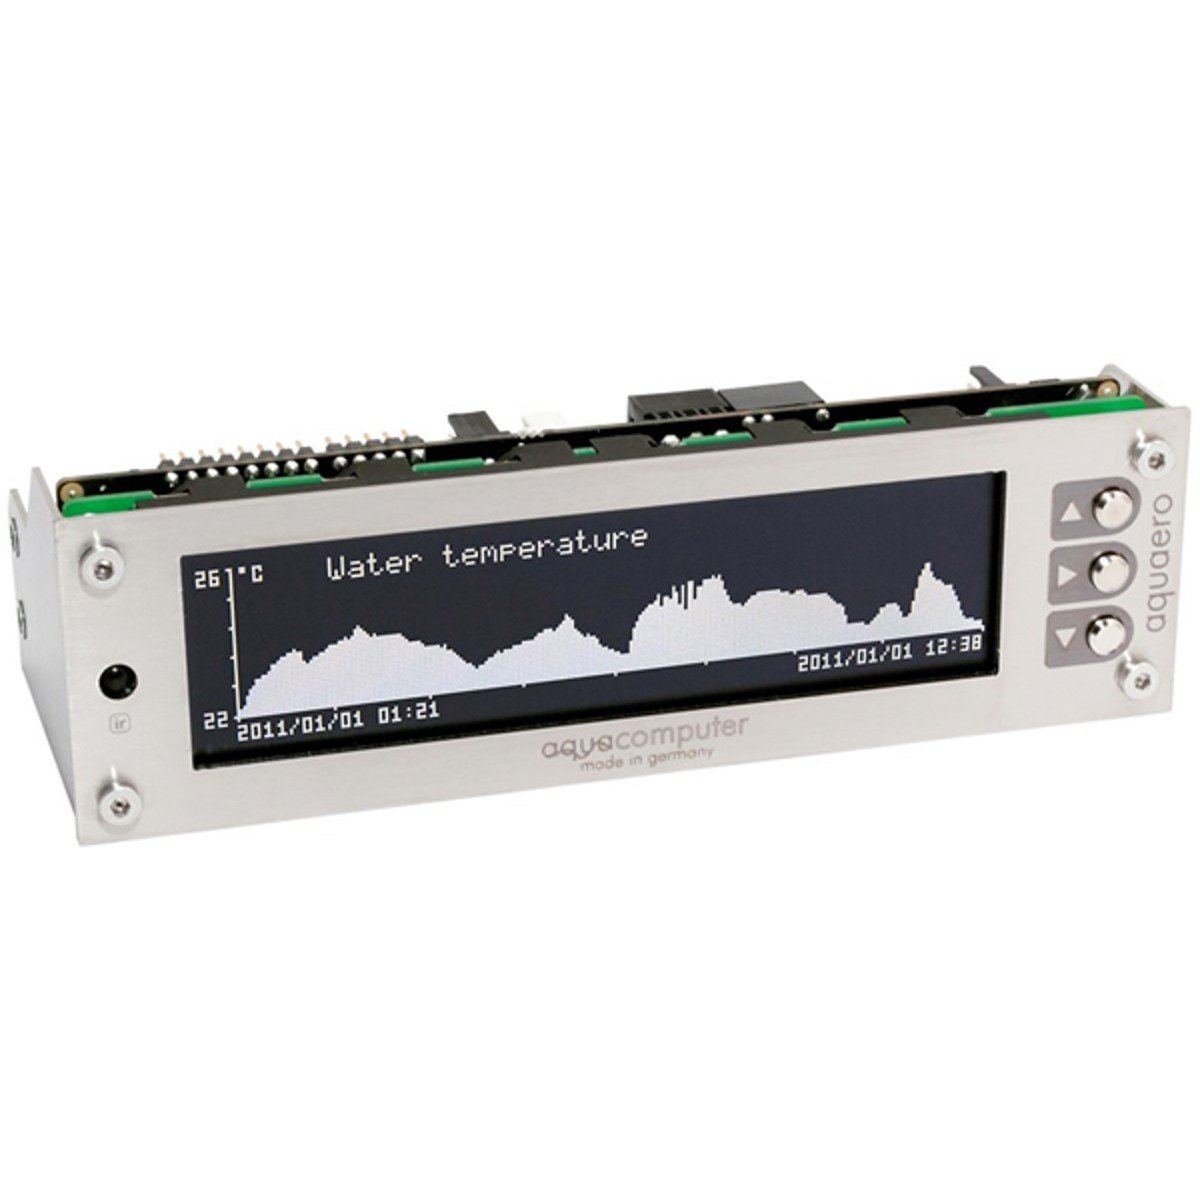 Aquacomputer Aquaero 6 PRO USB Fan Controller with Graphic LCD